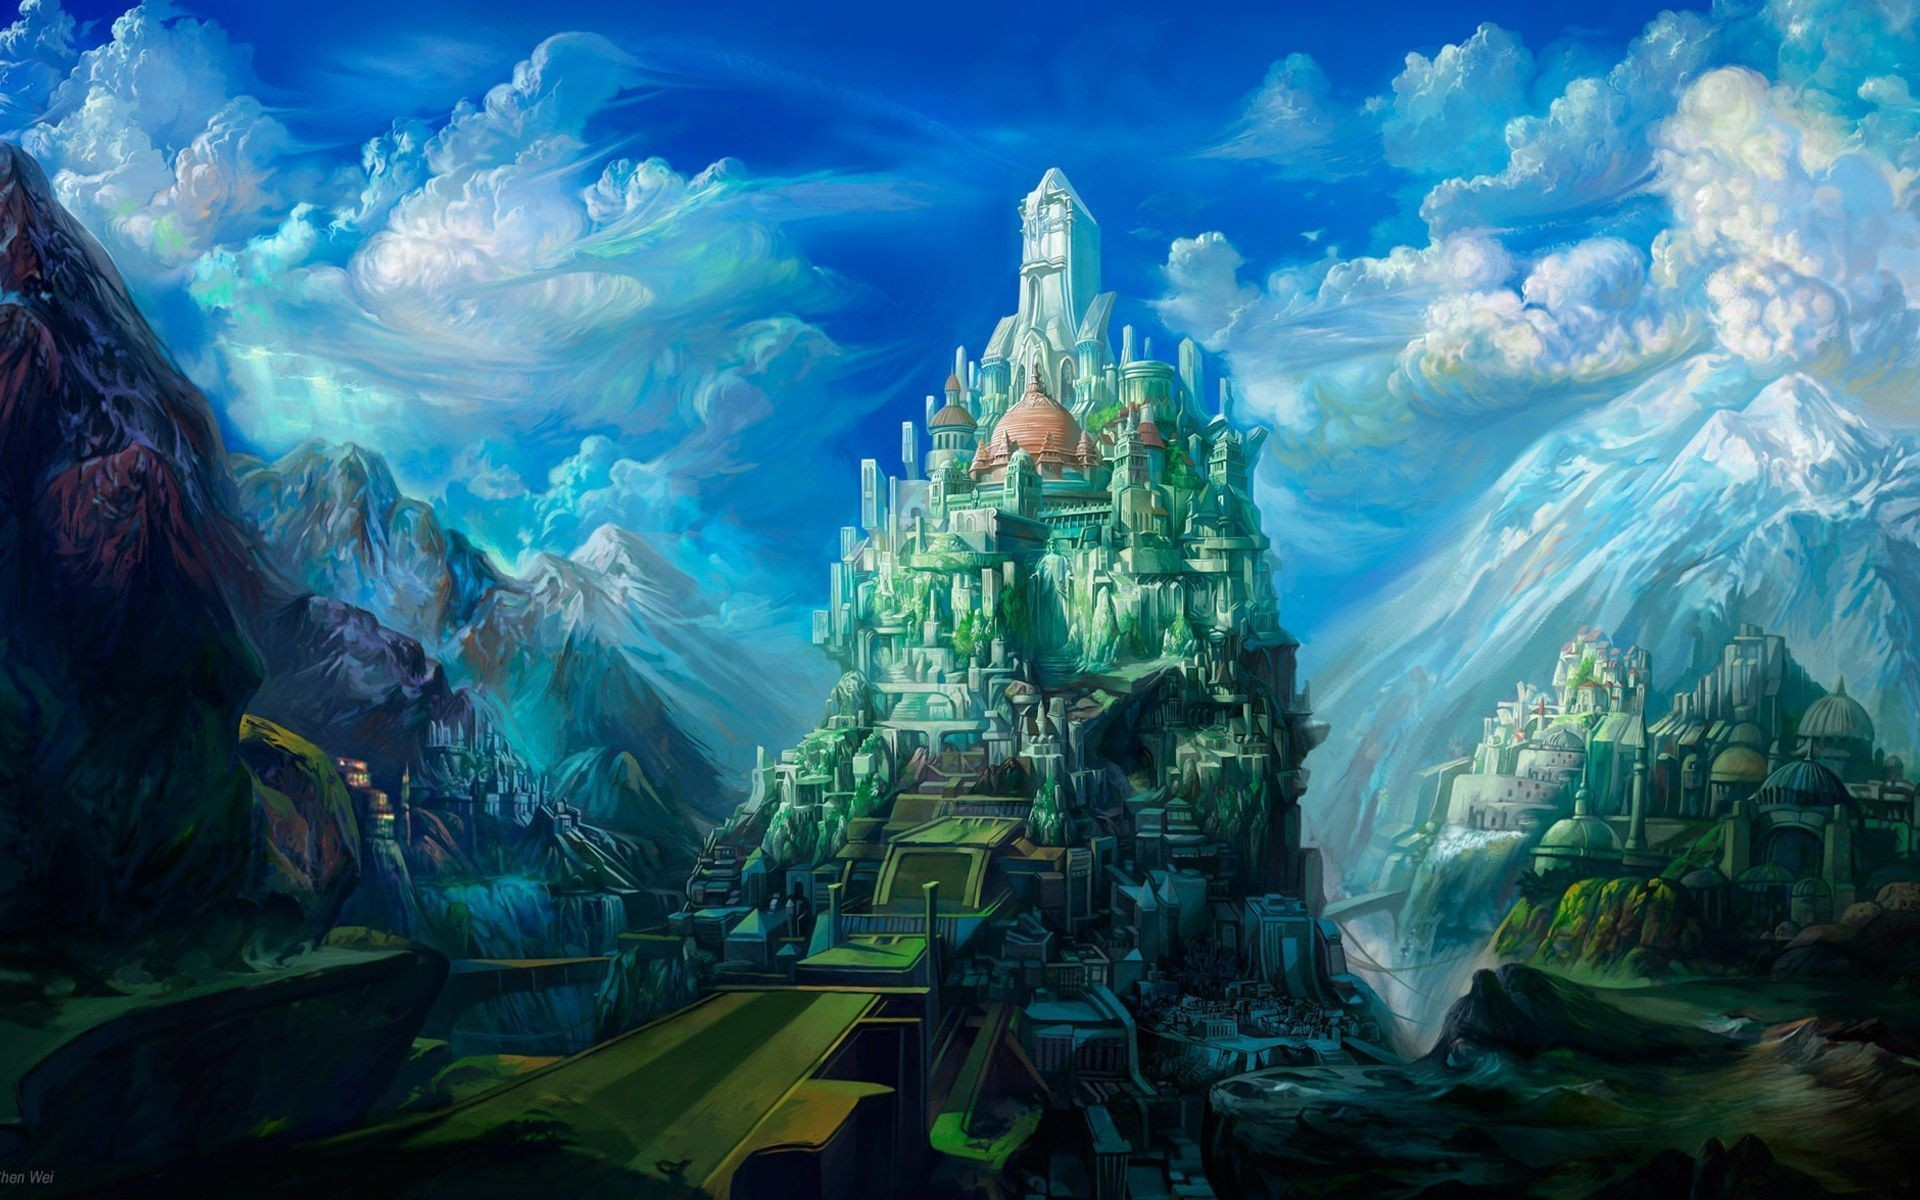 3d Fantasy Art Wallpapers 63 Images